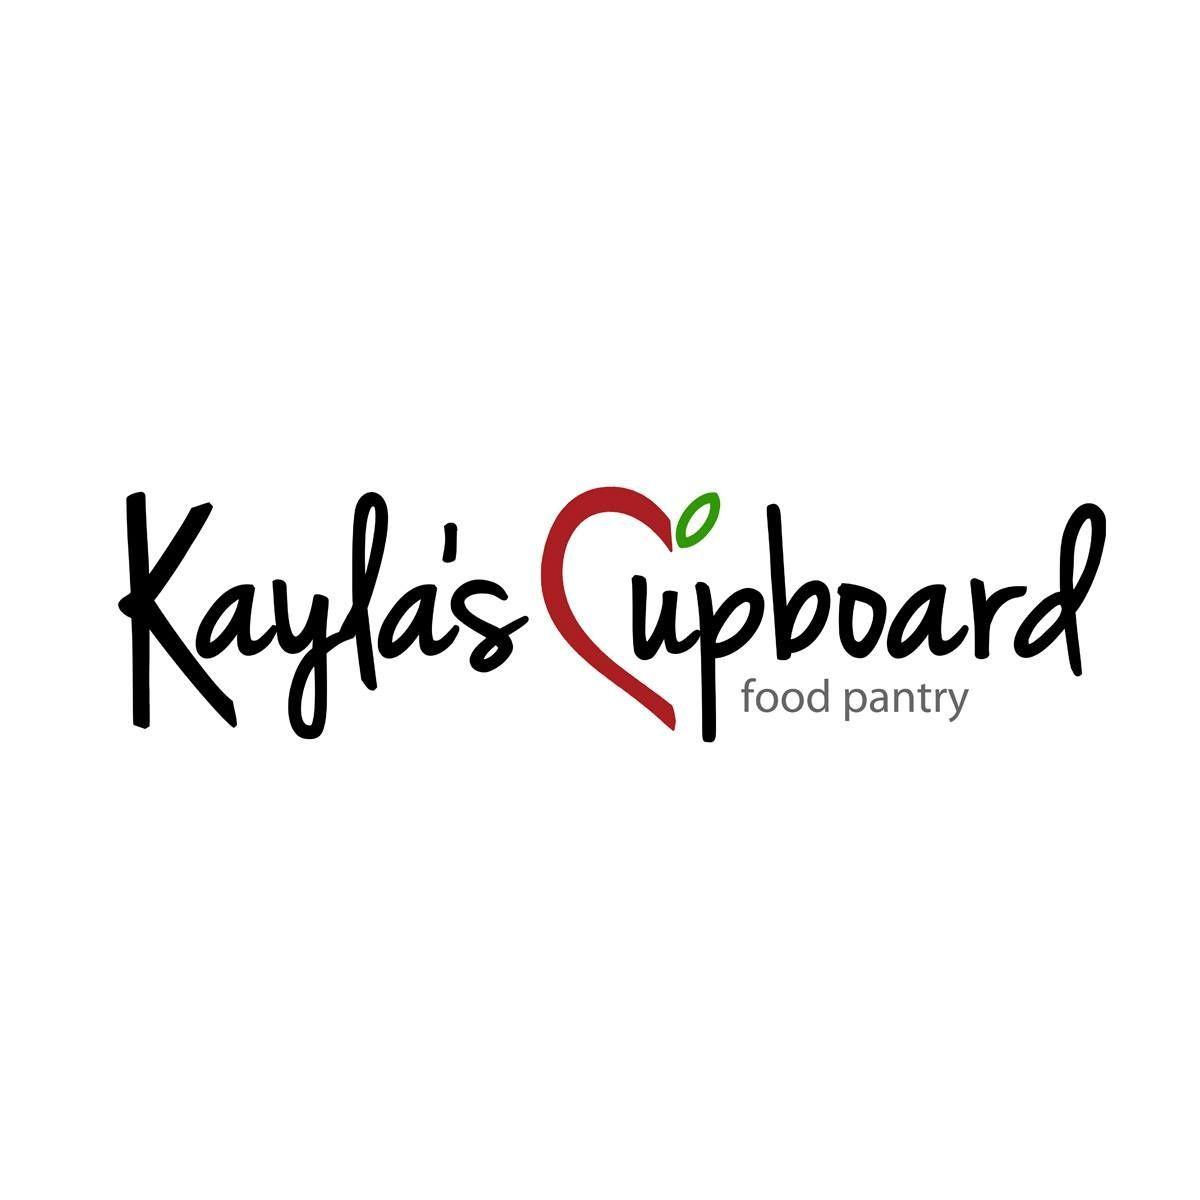 Kayla's Cupboard